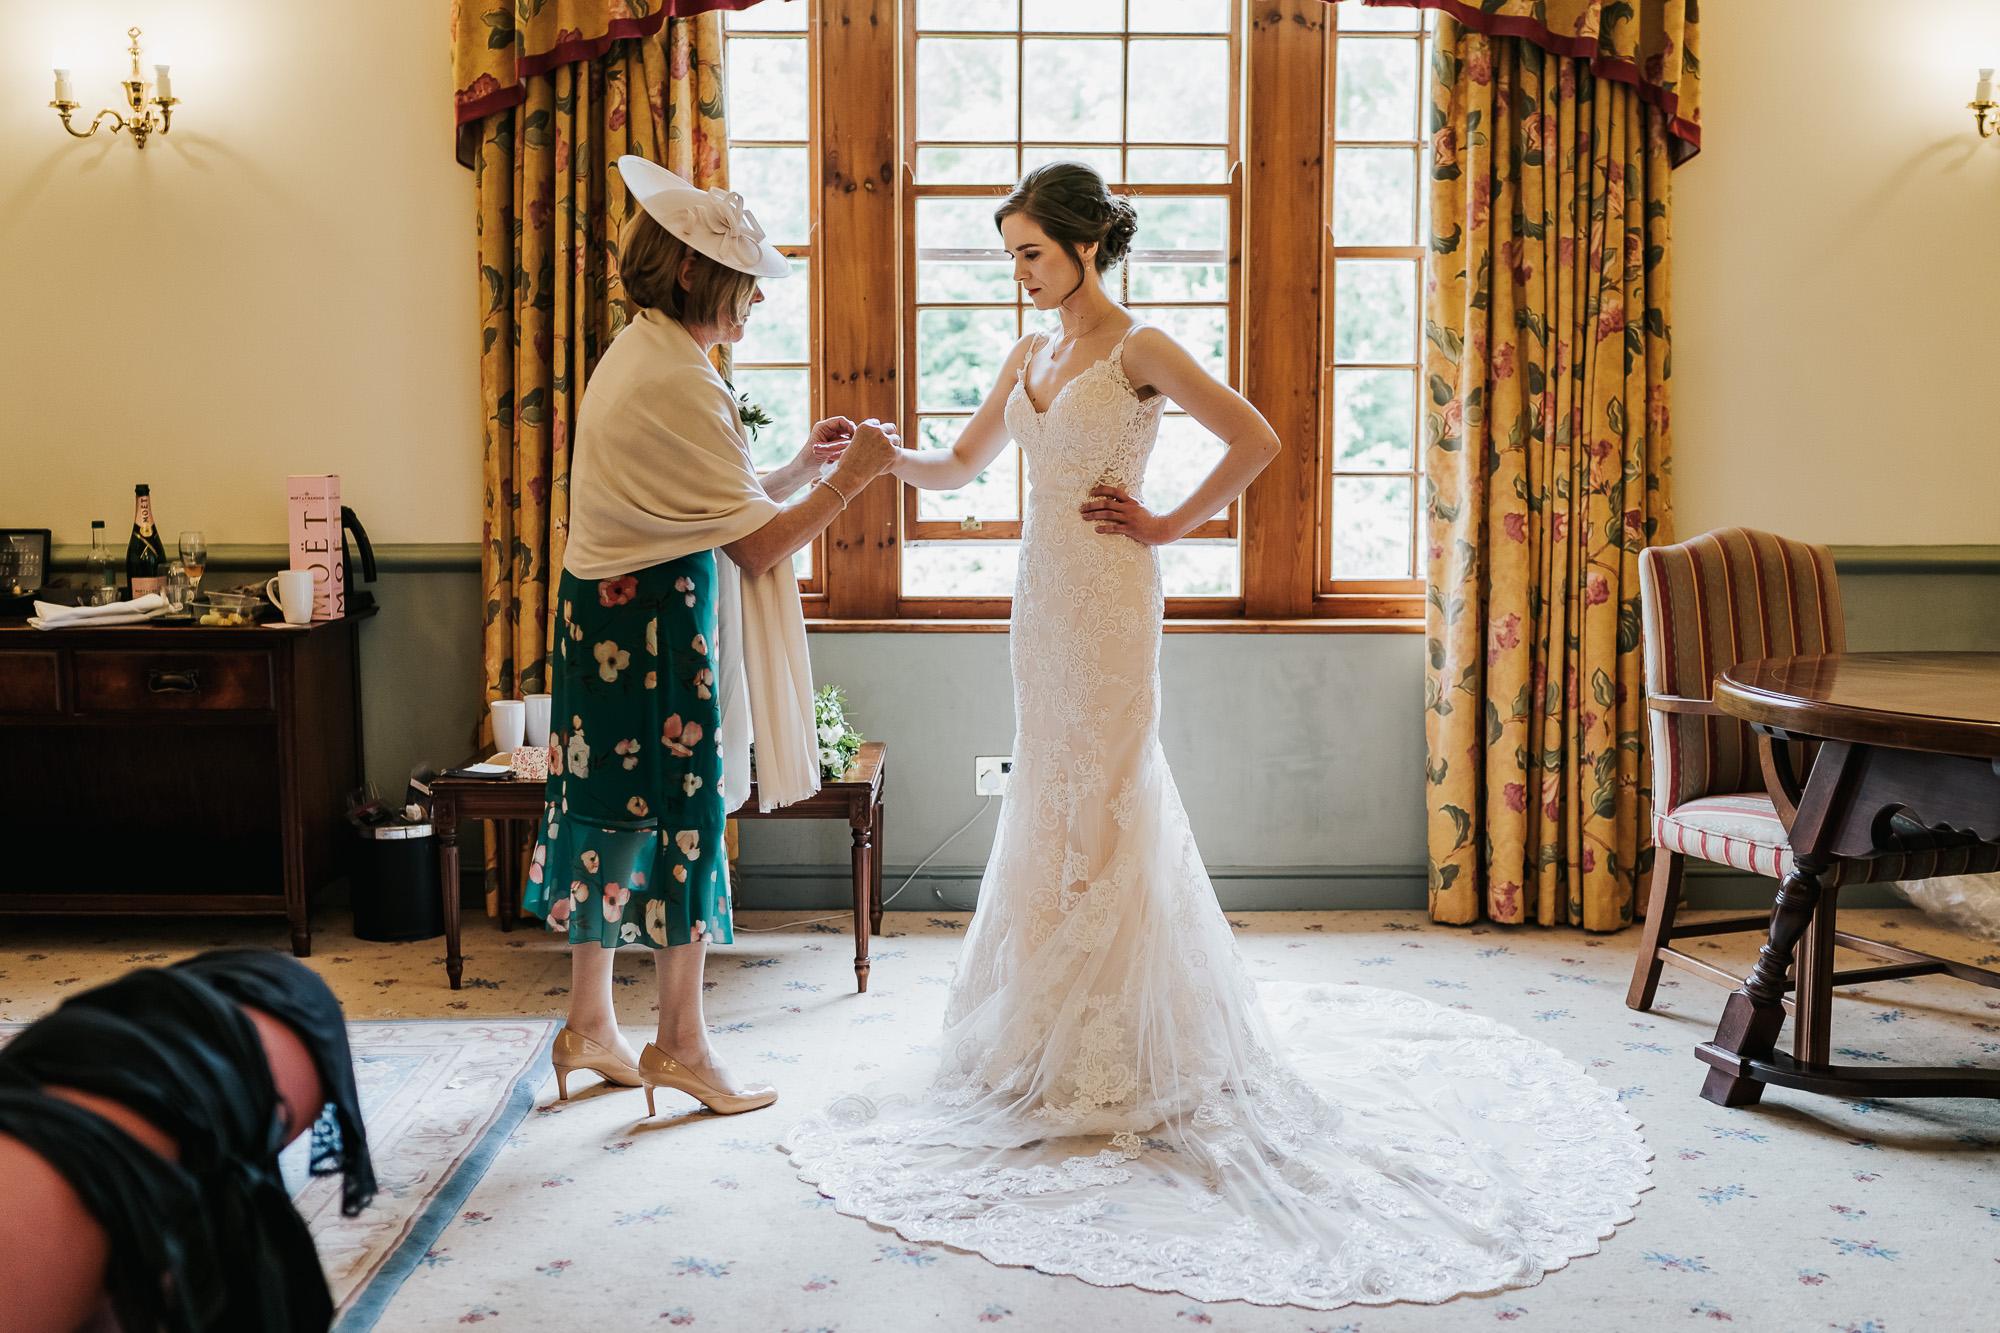 Nunsmere Hall Hotel Wedding photograhpy in cheshire wedding photographer (12 of 42).jpg